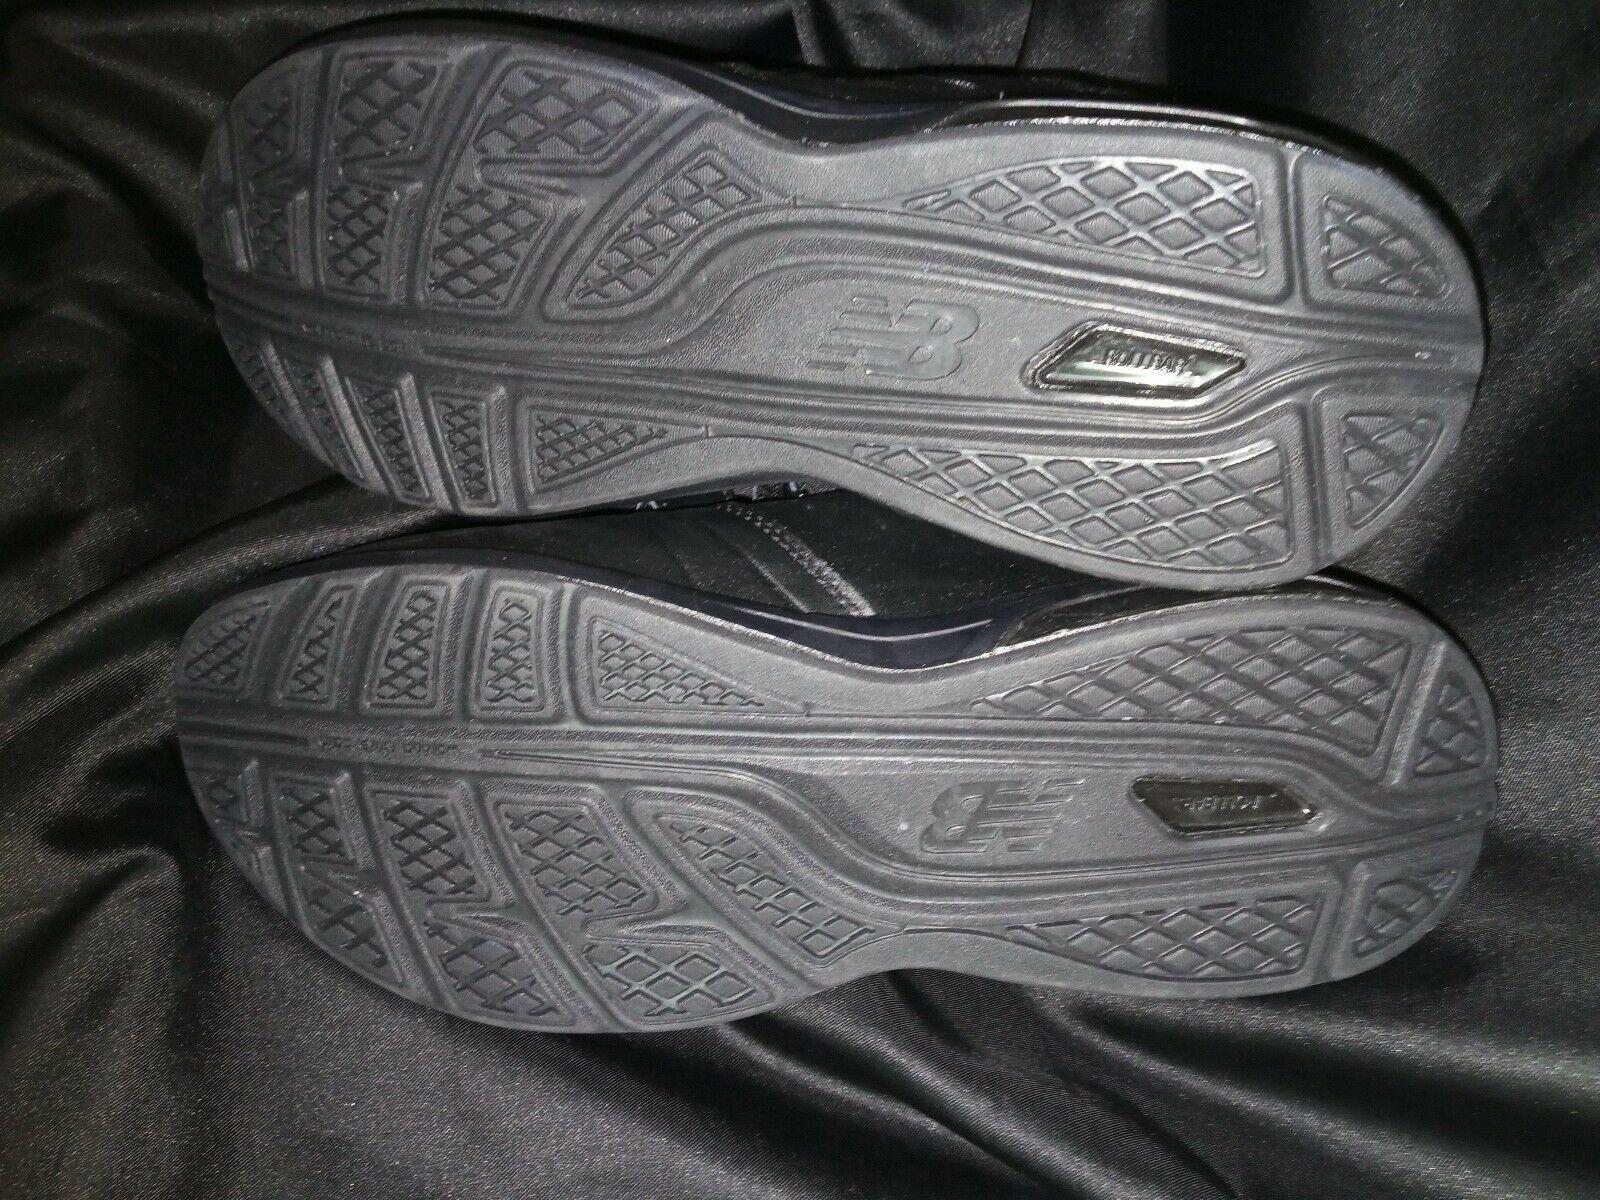 New Balance Womens Black Walking Shoes Sneakers 11 B WW813HBK